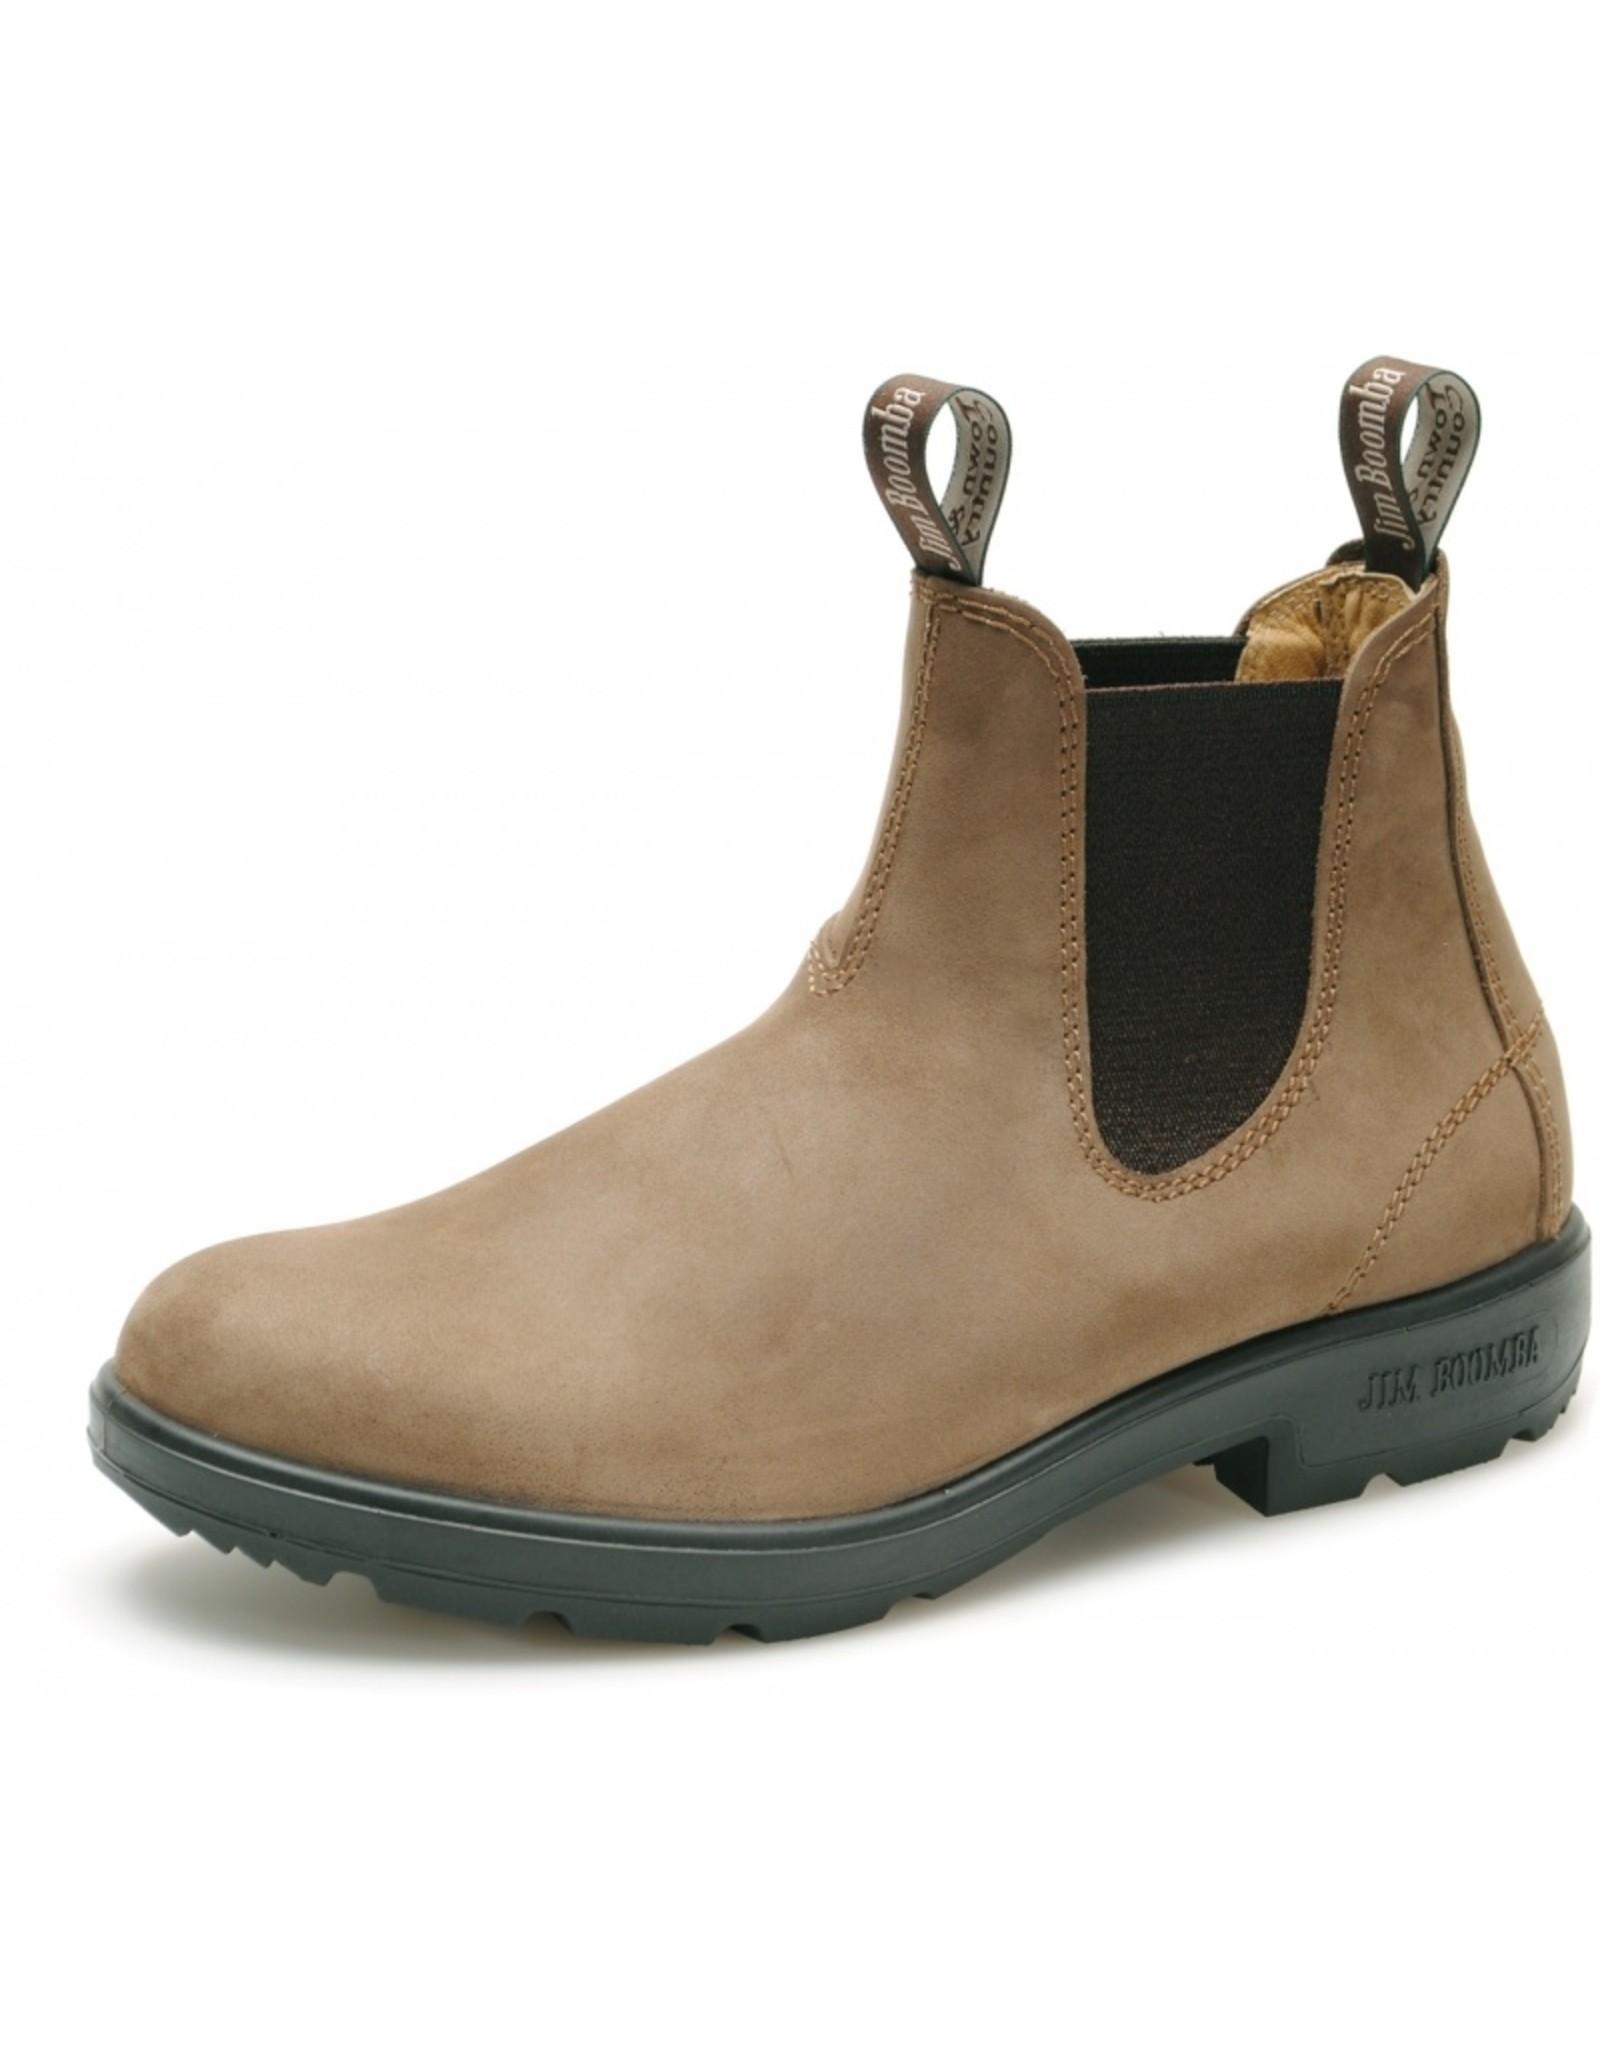 Jim Boomba Jim Boomba Chelsea Boot